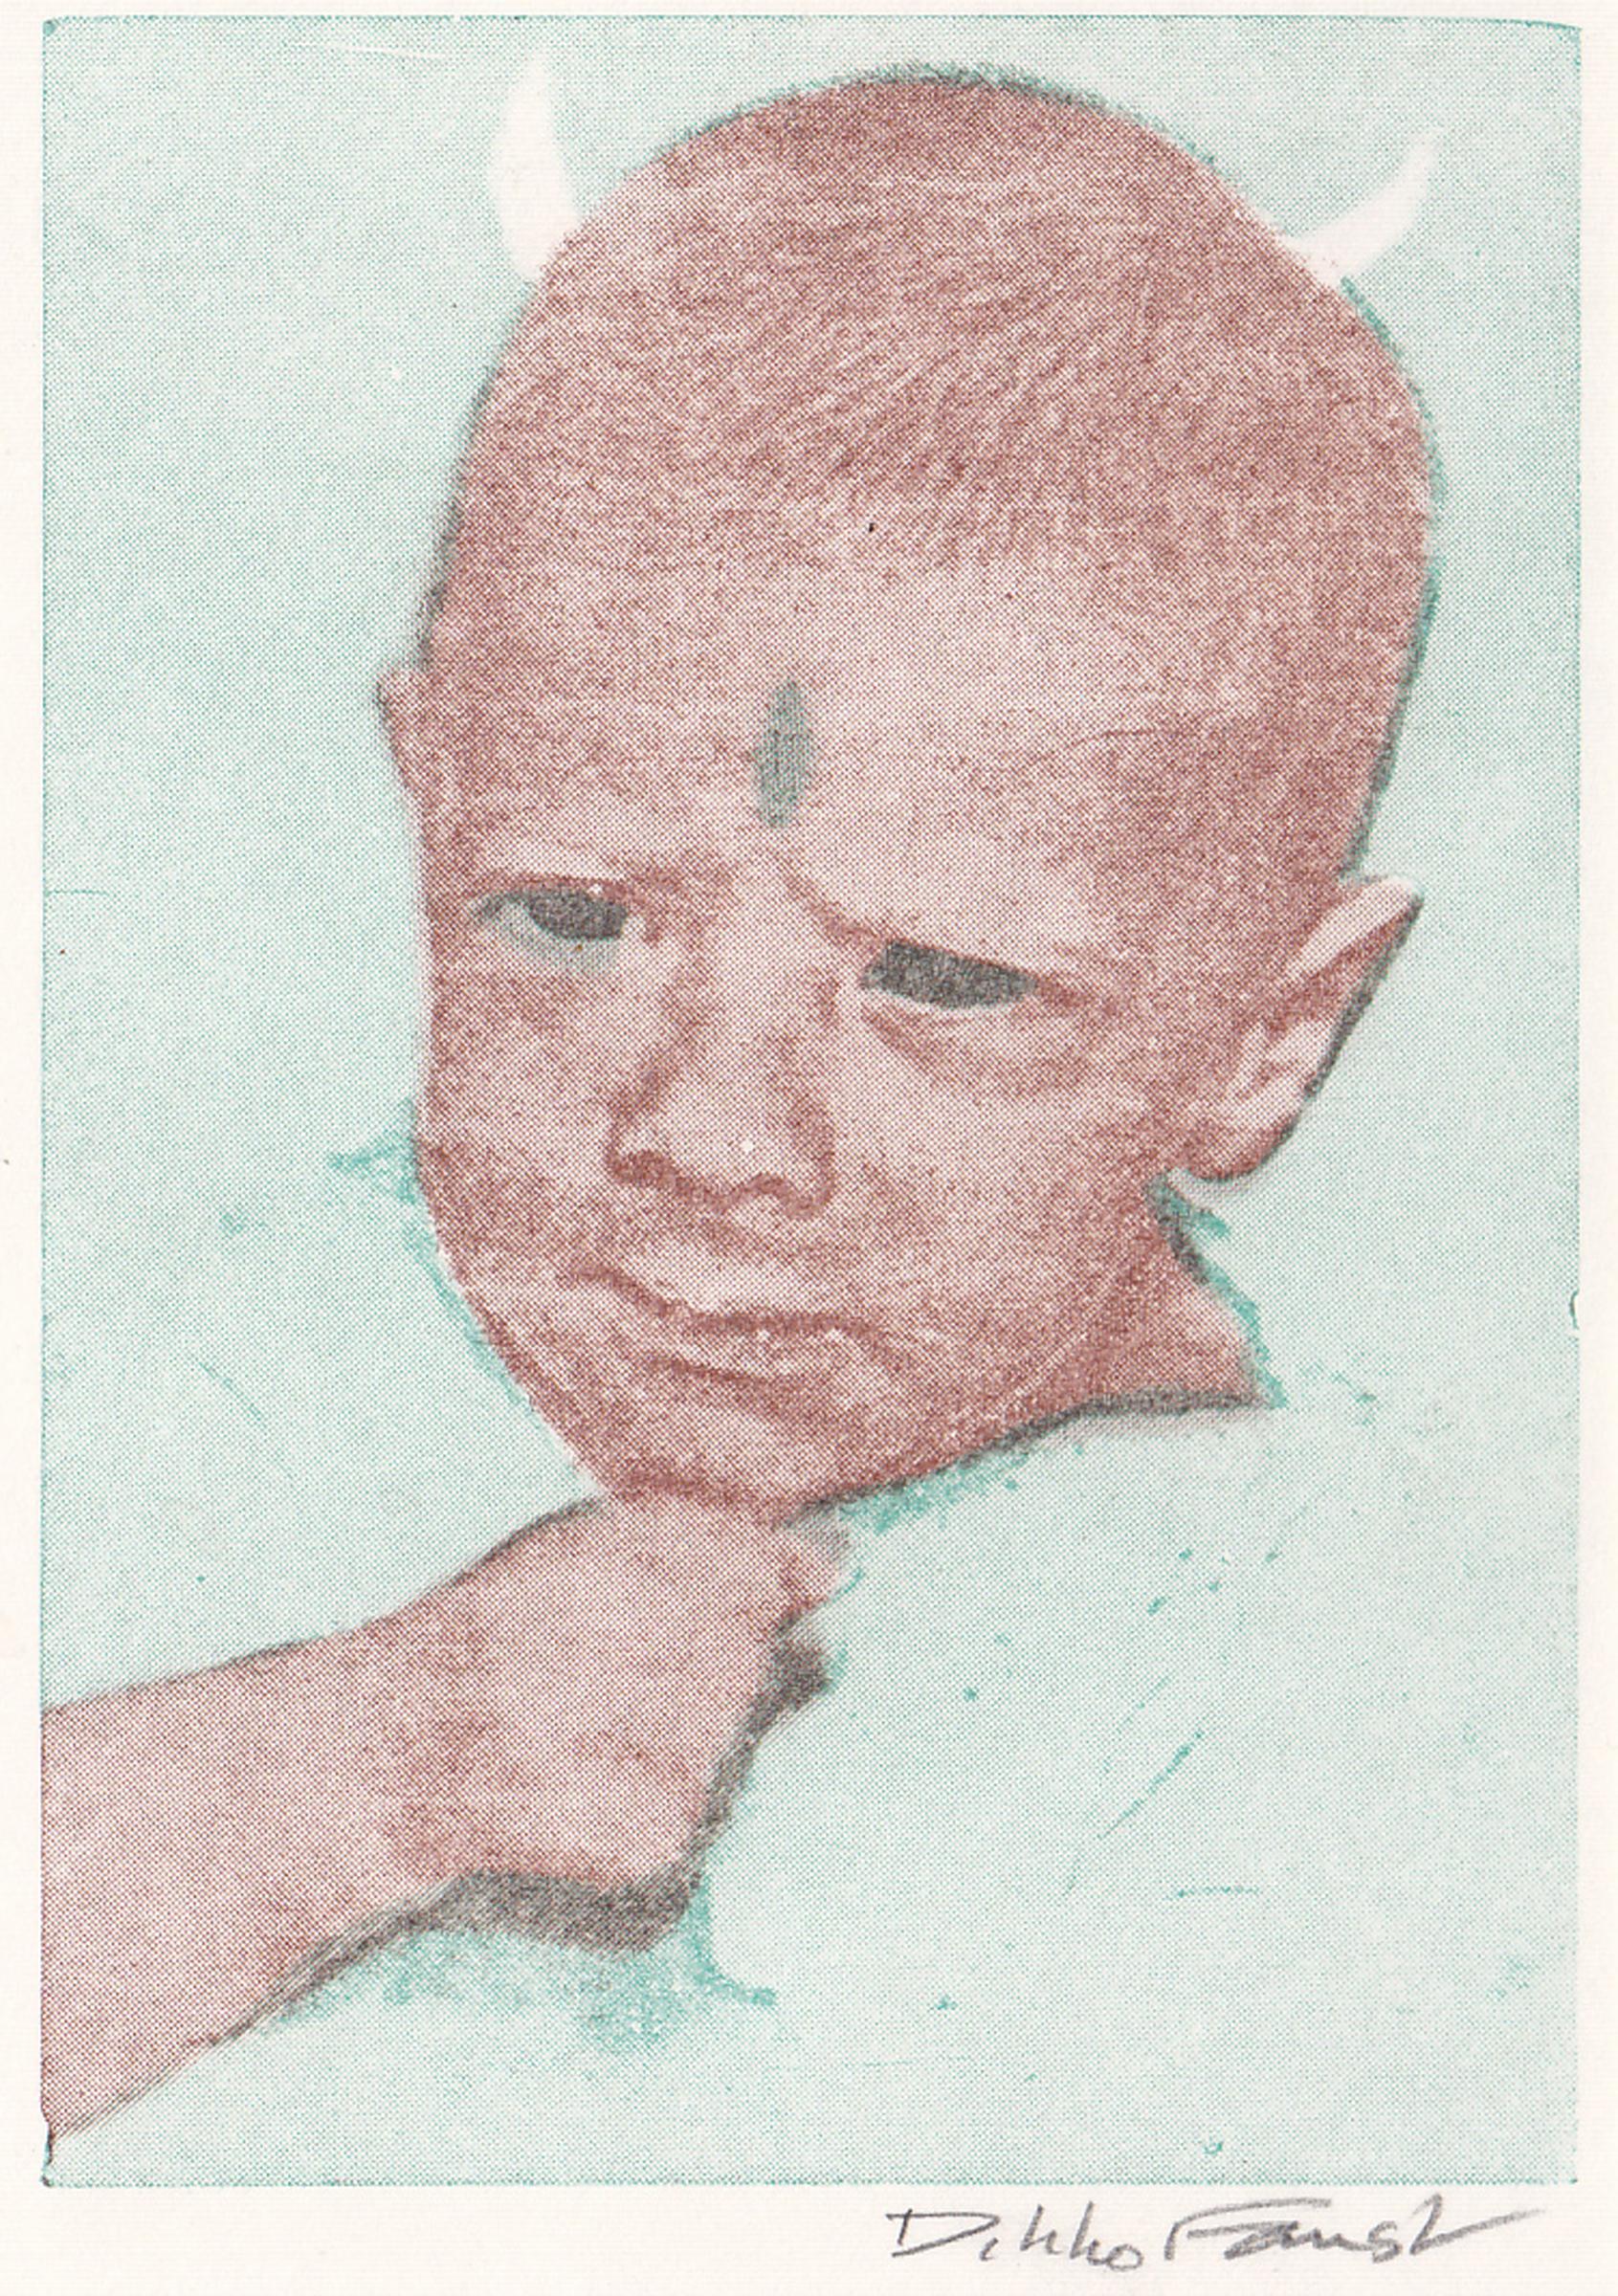 Demon Boy by Dikko Faust